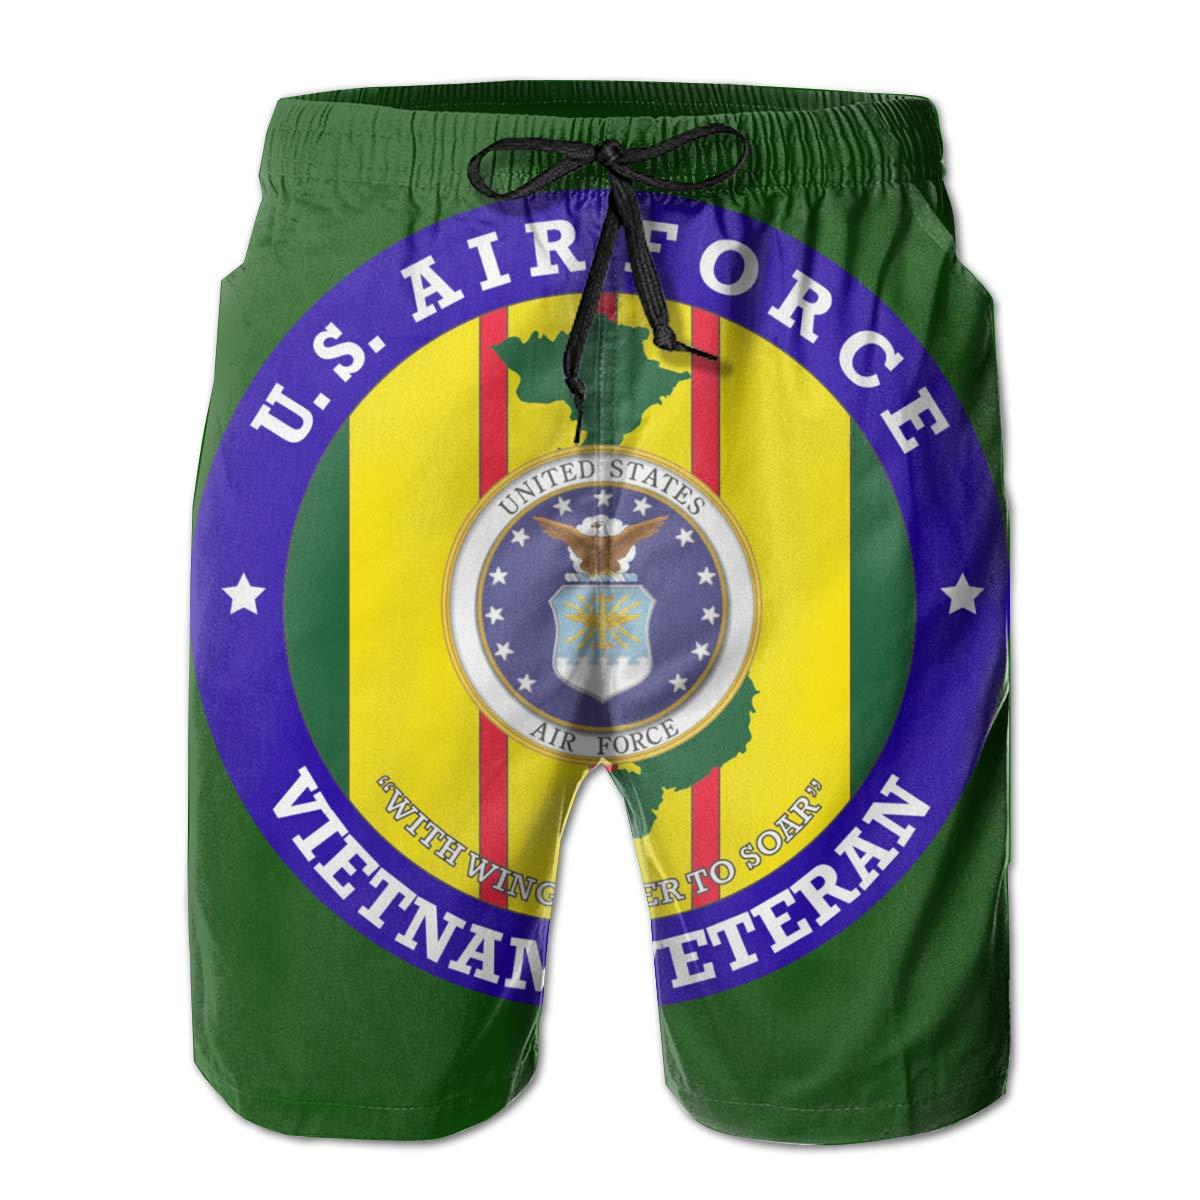 Air Force Vietnam Veteran Mens Board Shorts,Casual Shorts,Beach Shorts Summer Boardshorts QKQ77 KK7 U.S